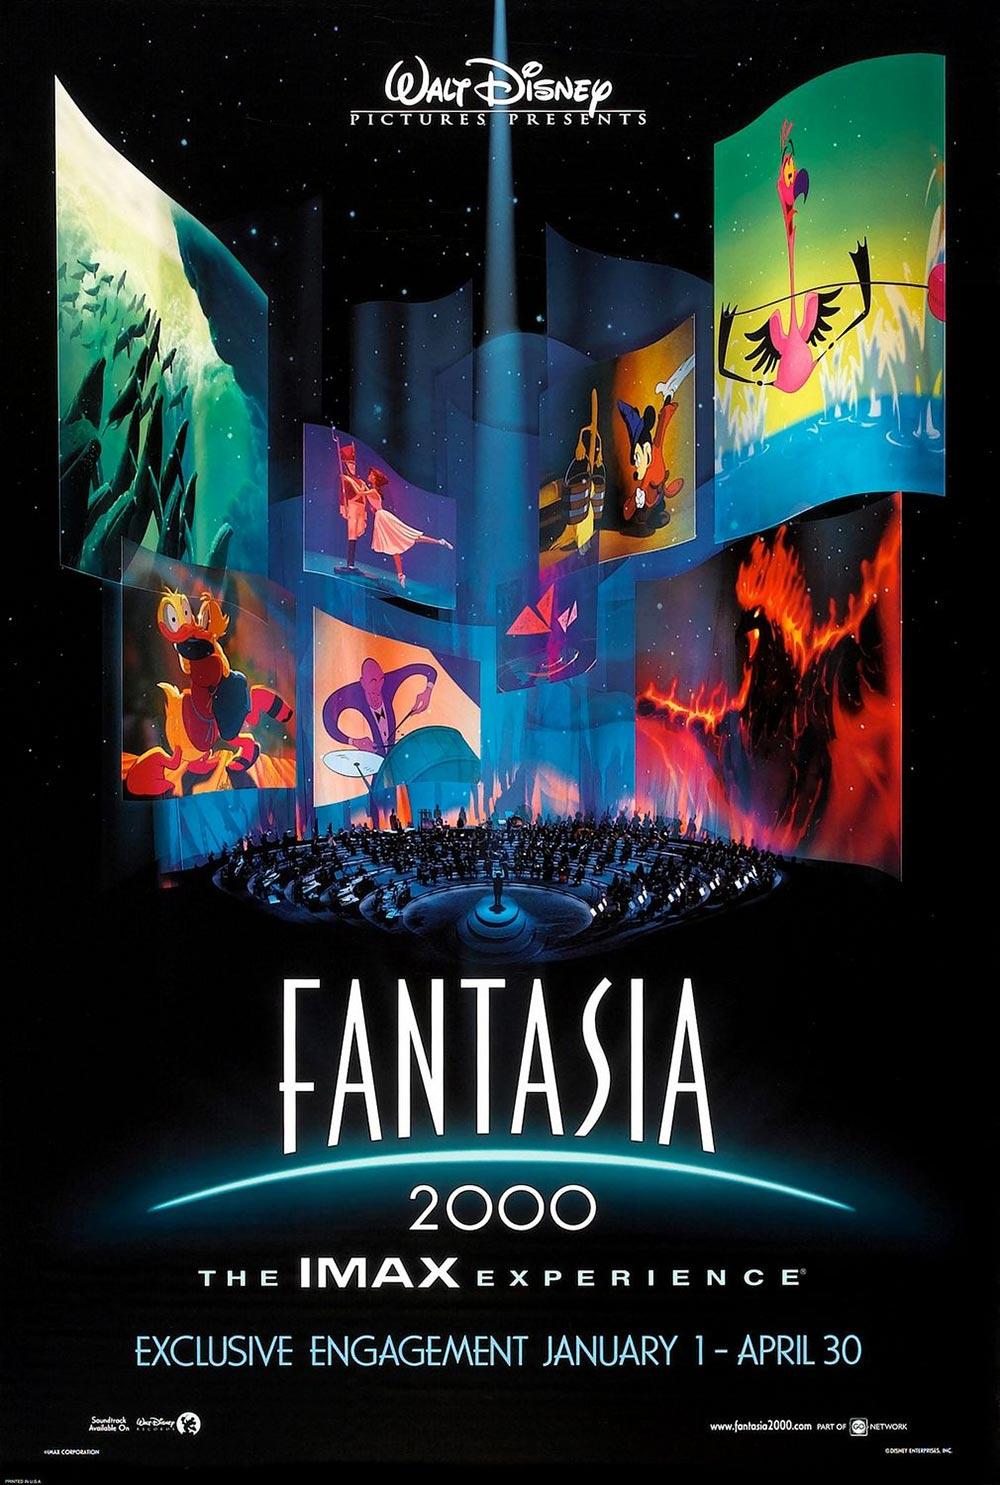 Fantasia 2000 Original IMAX Release Poster